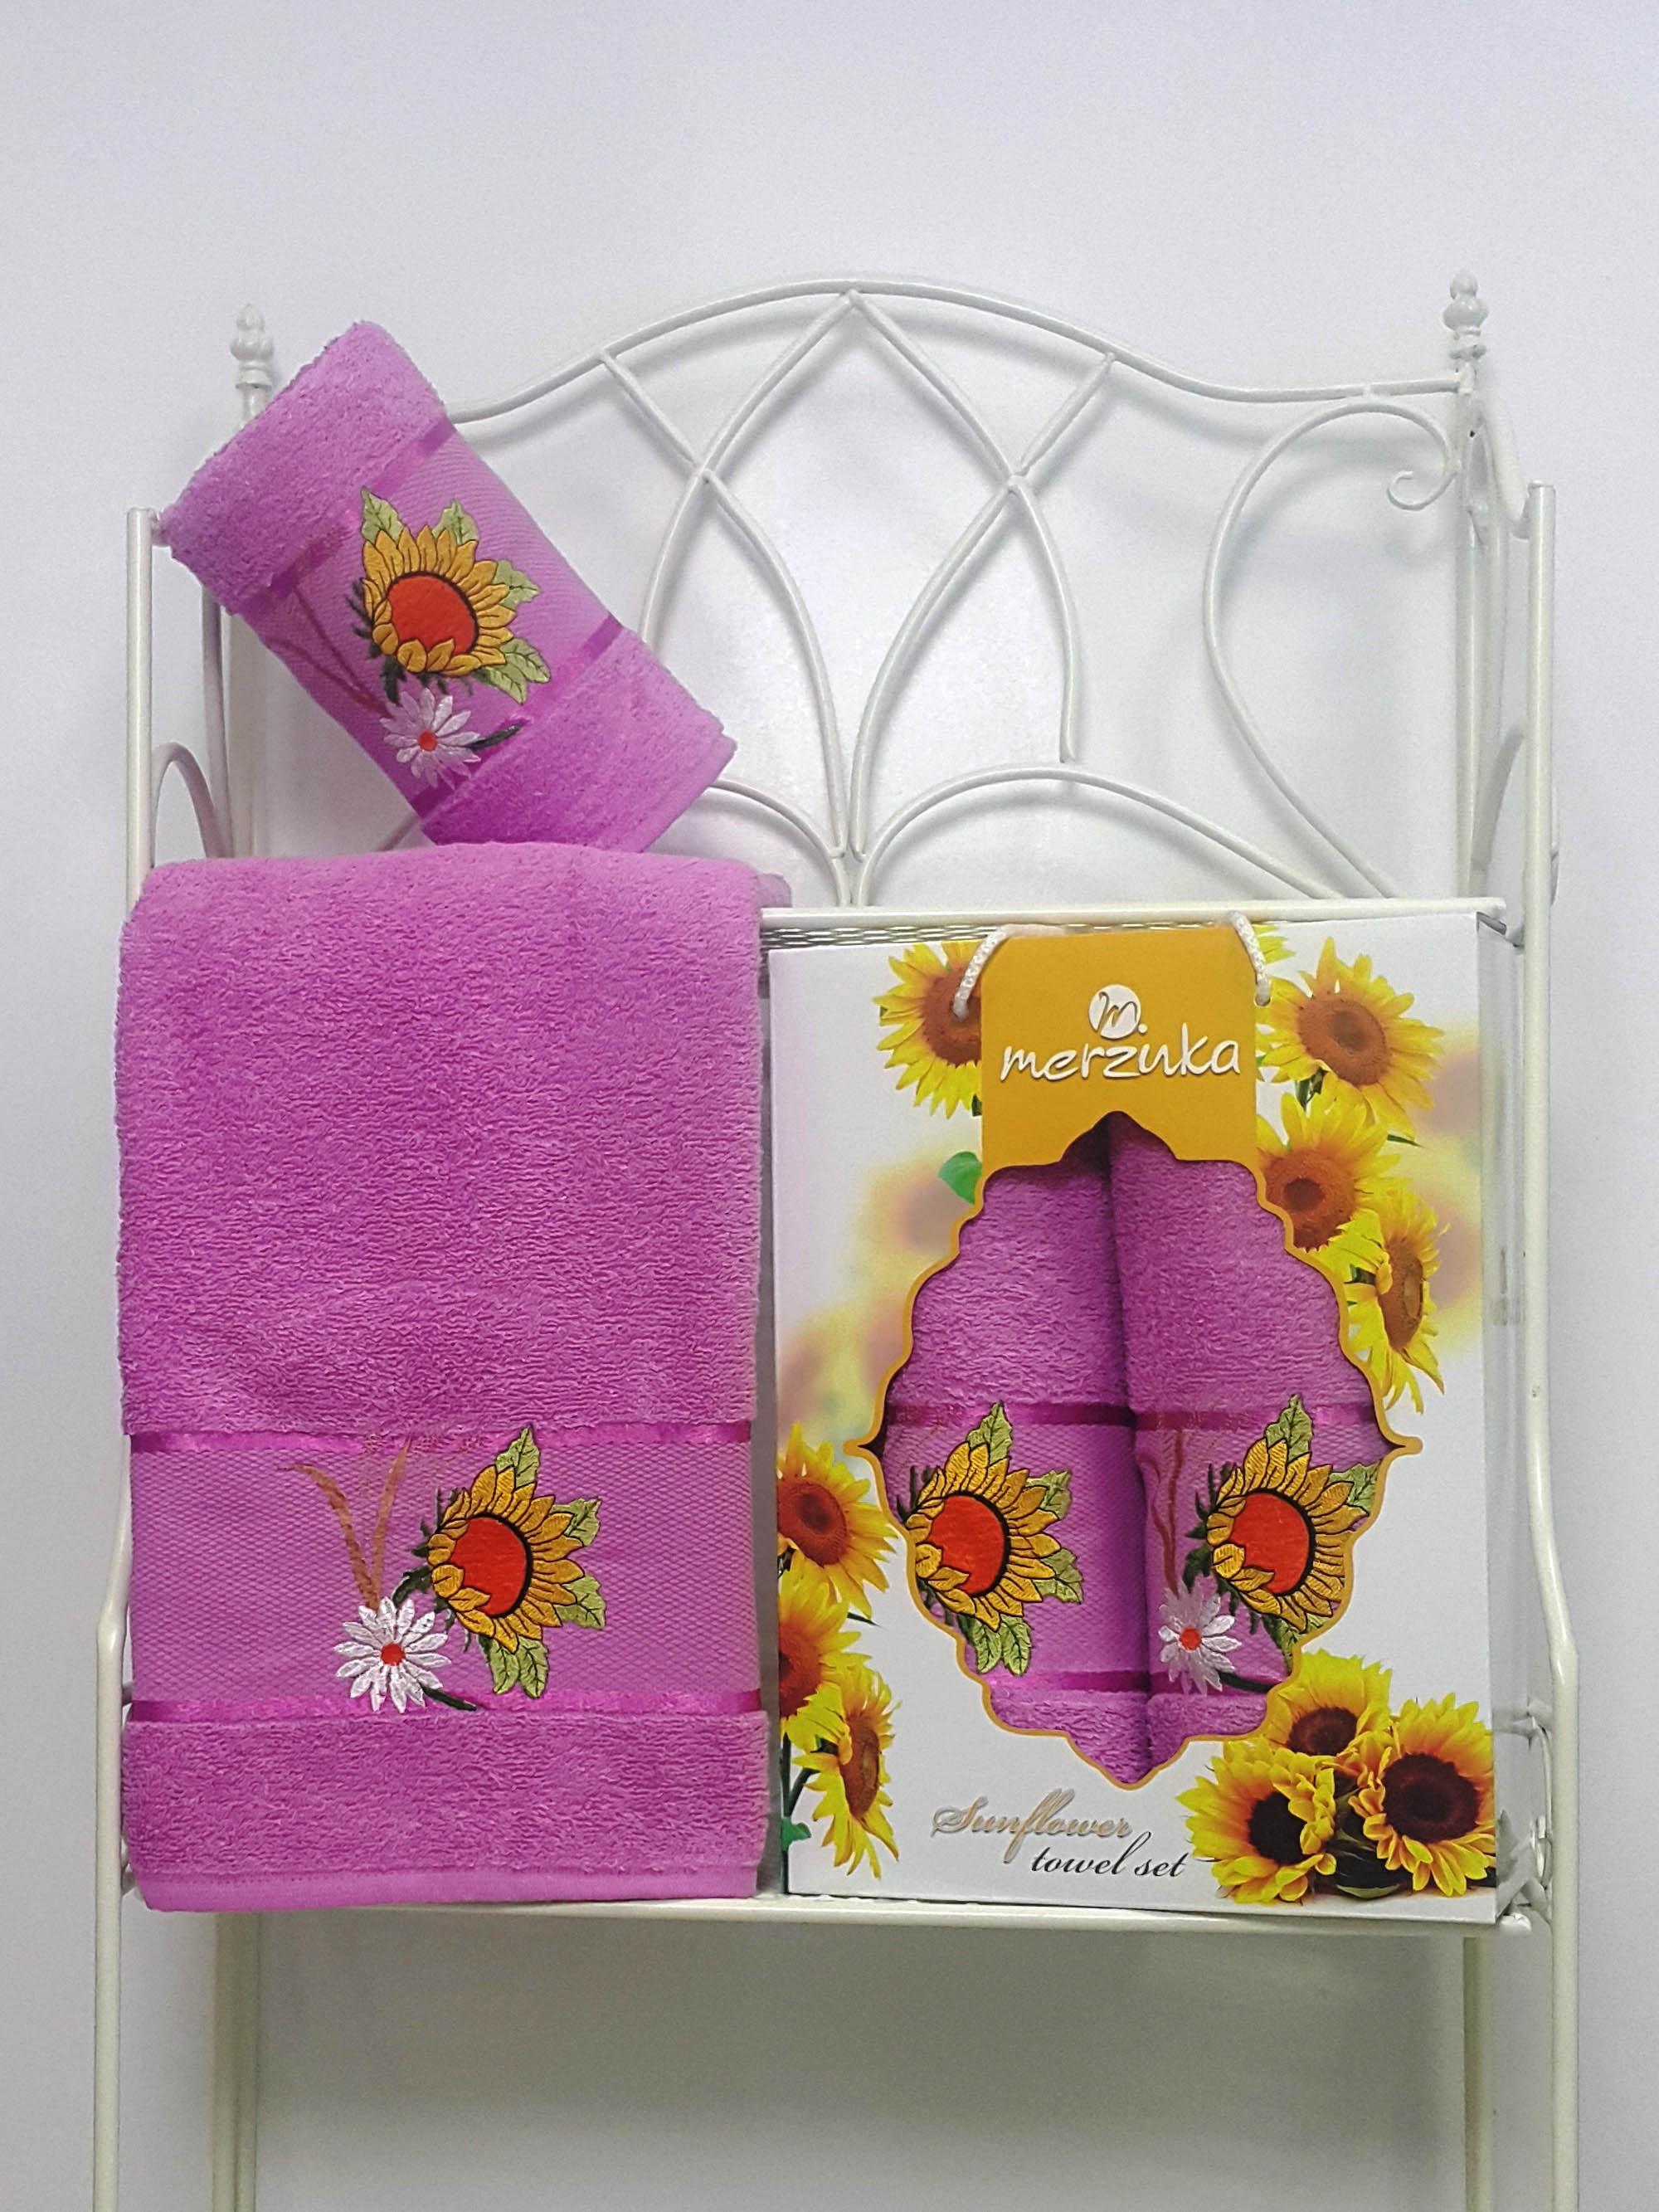 Полотенца Oran Merzuka Набор из 2 полотенец Sunflower Цвет: Светло-Лиловый набор из 3 полотенец merzuka sakura 50х90 2 70х140 8432 оранжевый